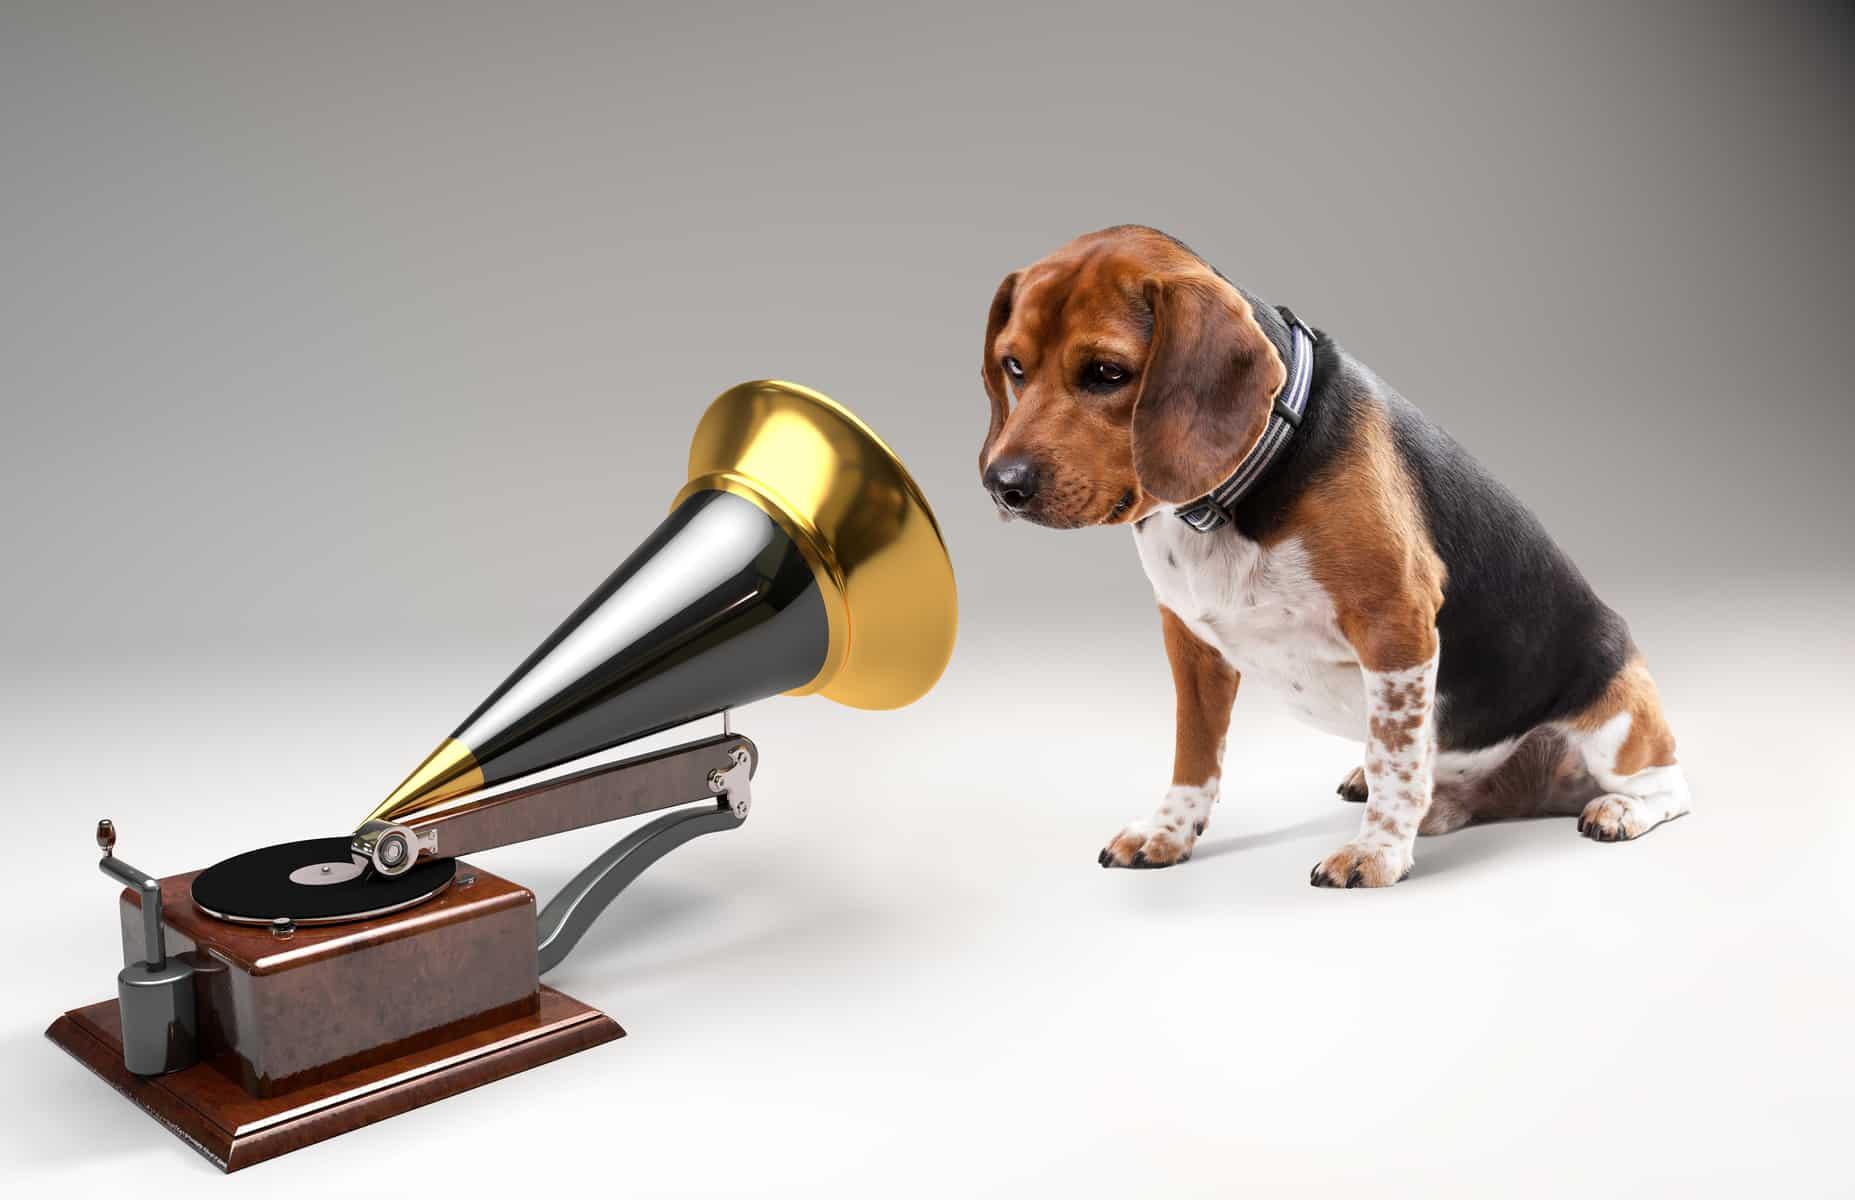 Dog Listening To Music Icalmpet